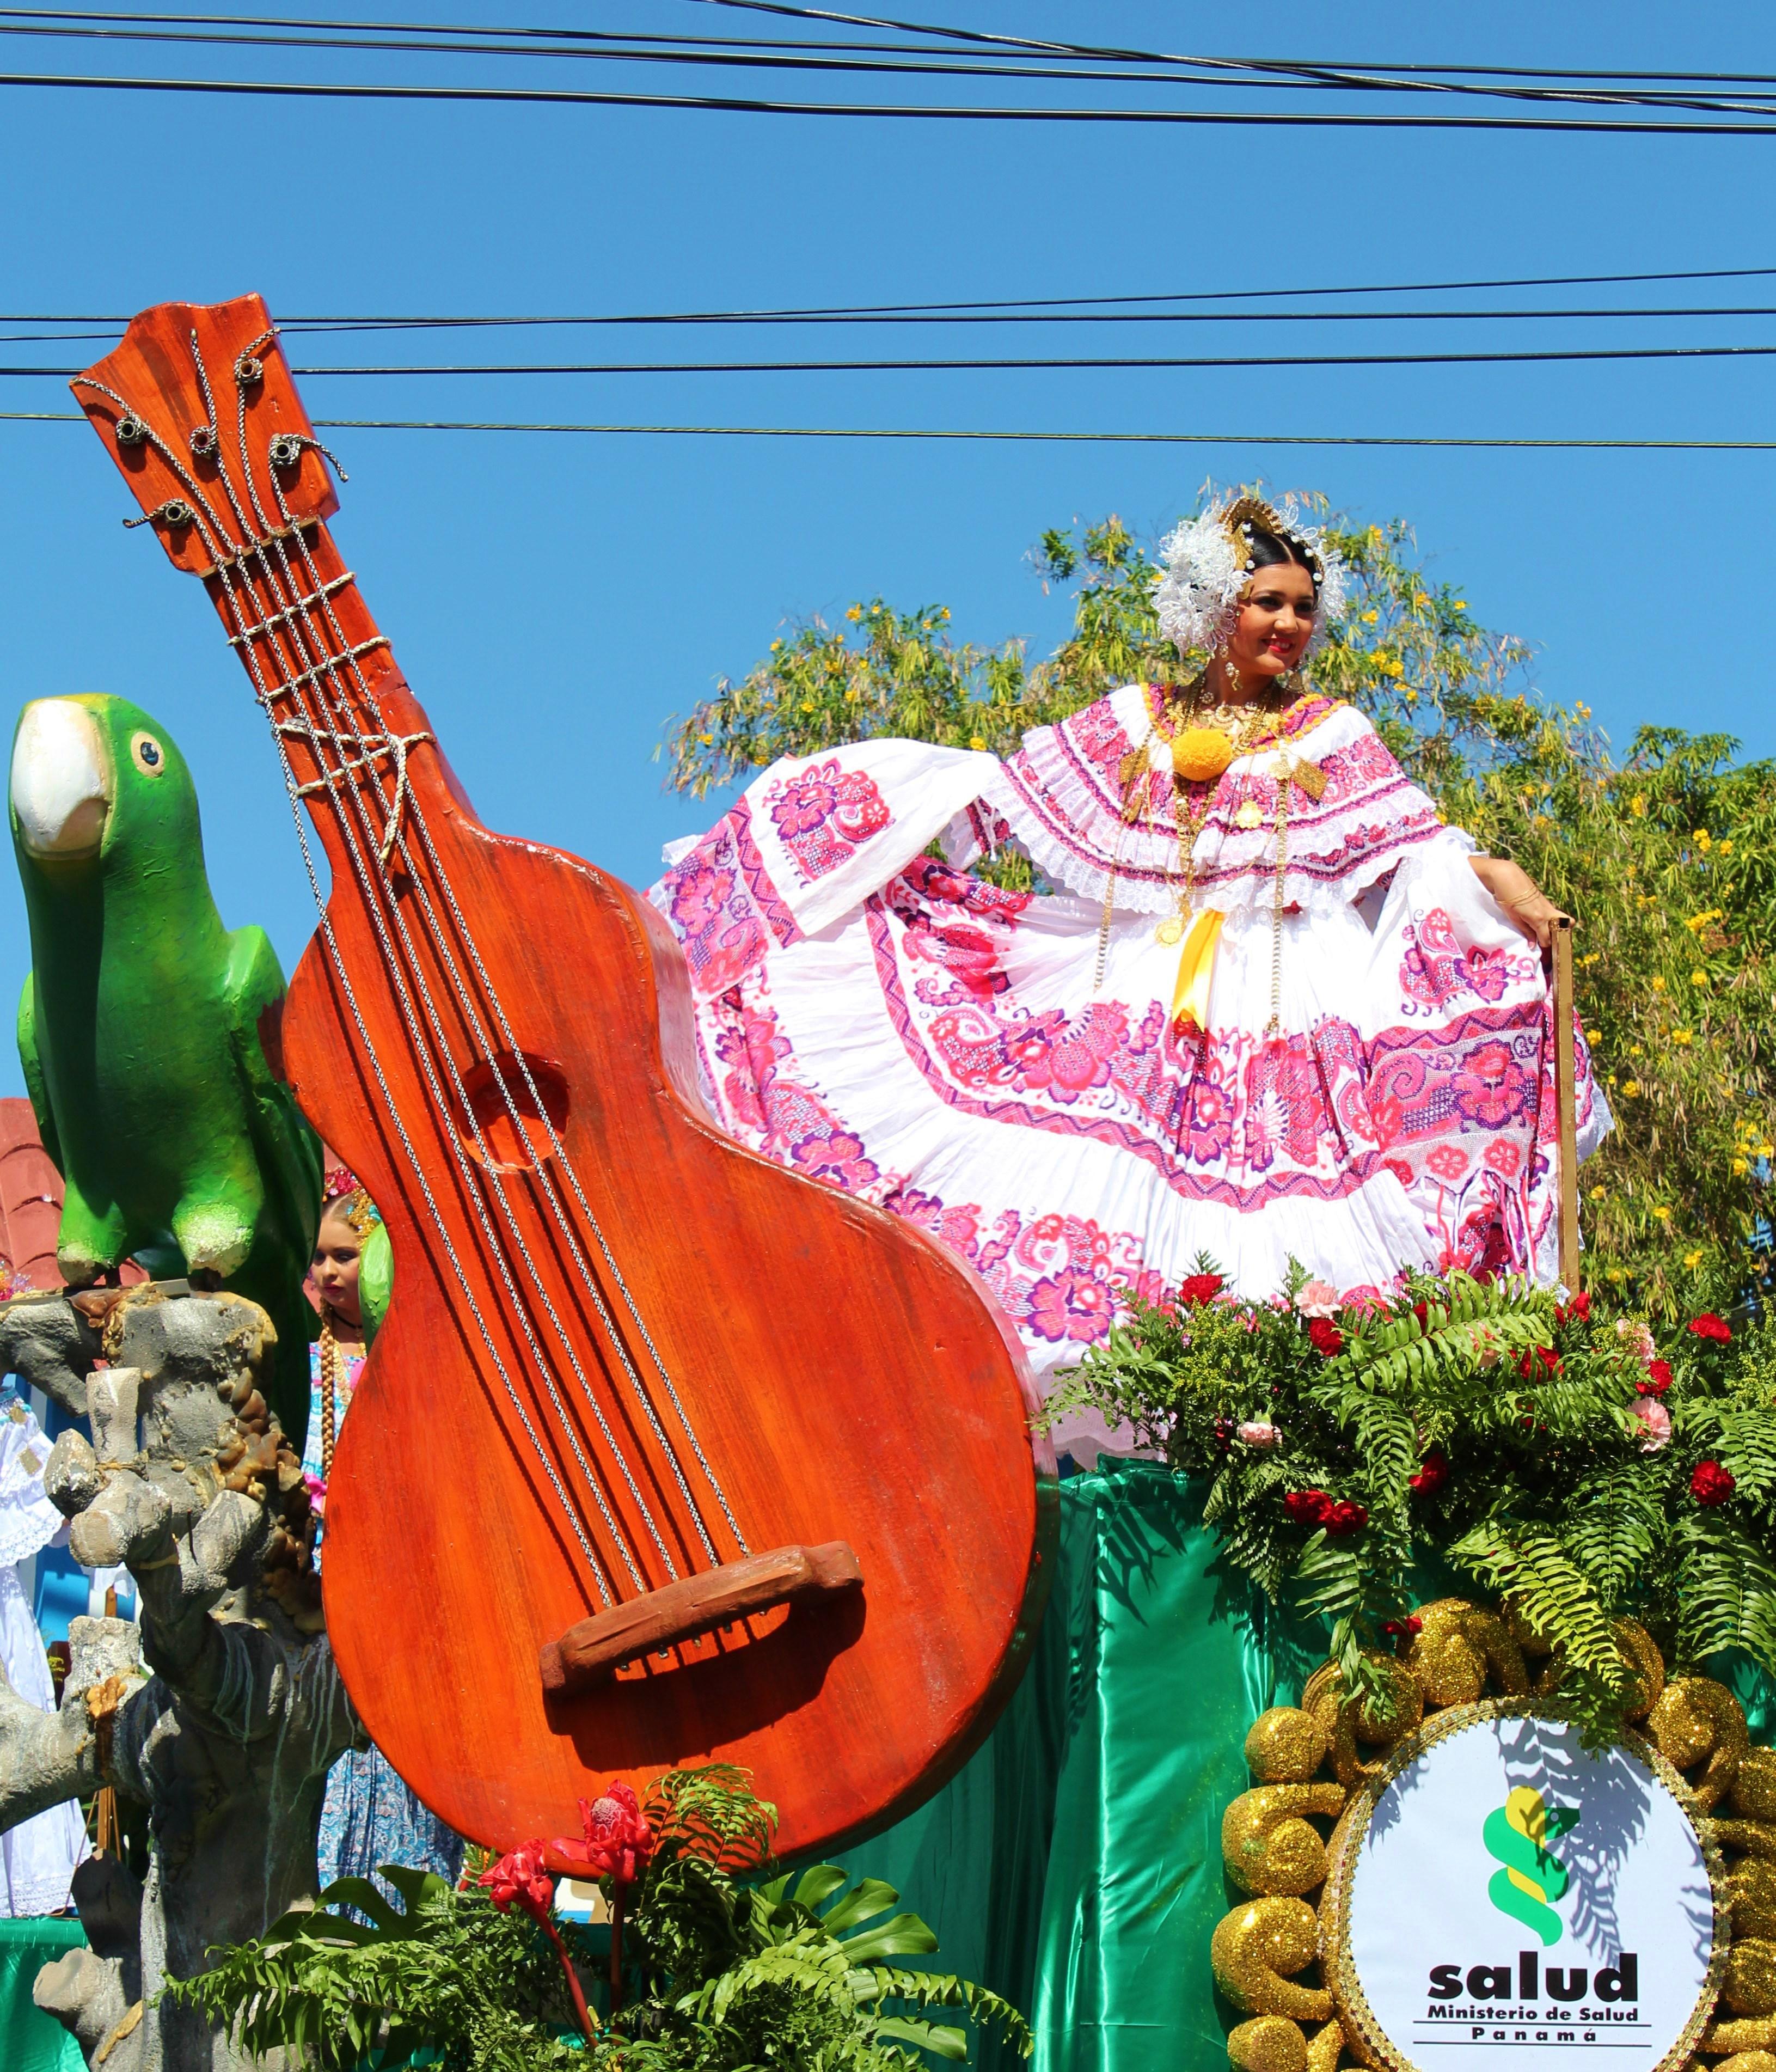 pollera-float-2 A Panama Road Trip Panama Panama Fairs and Festivals